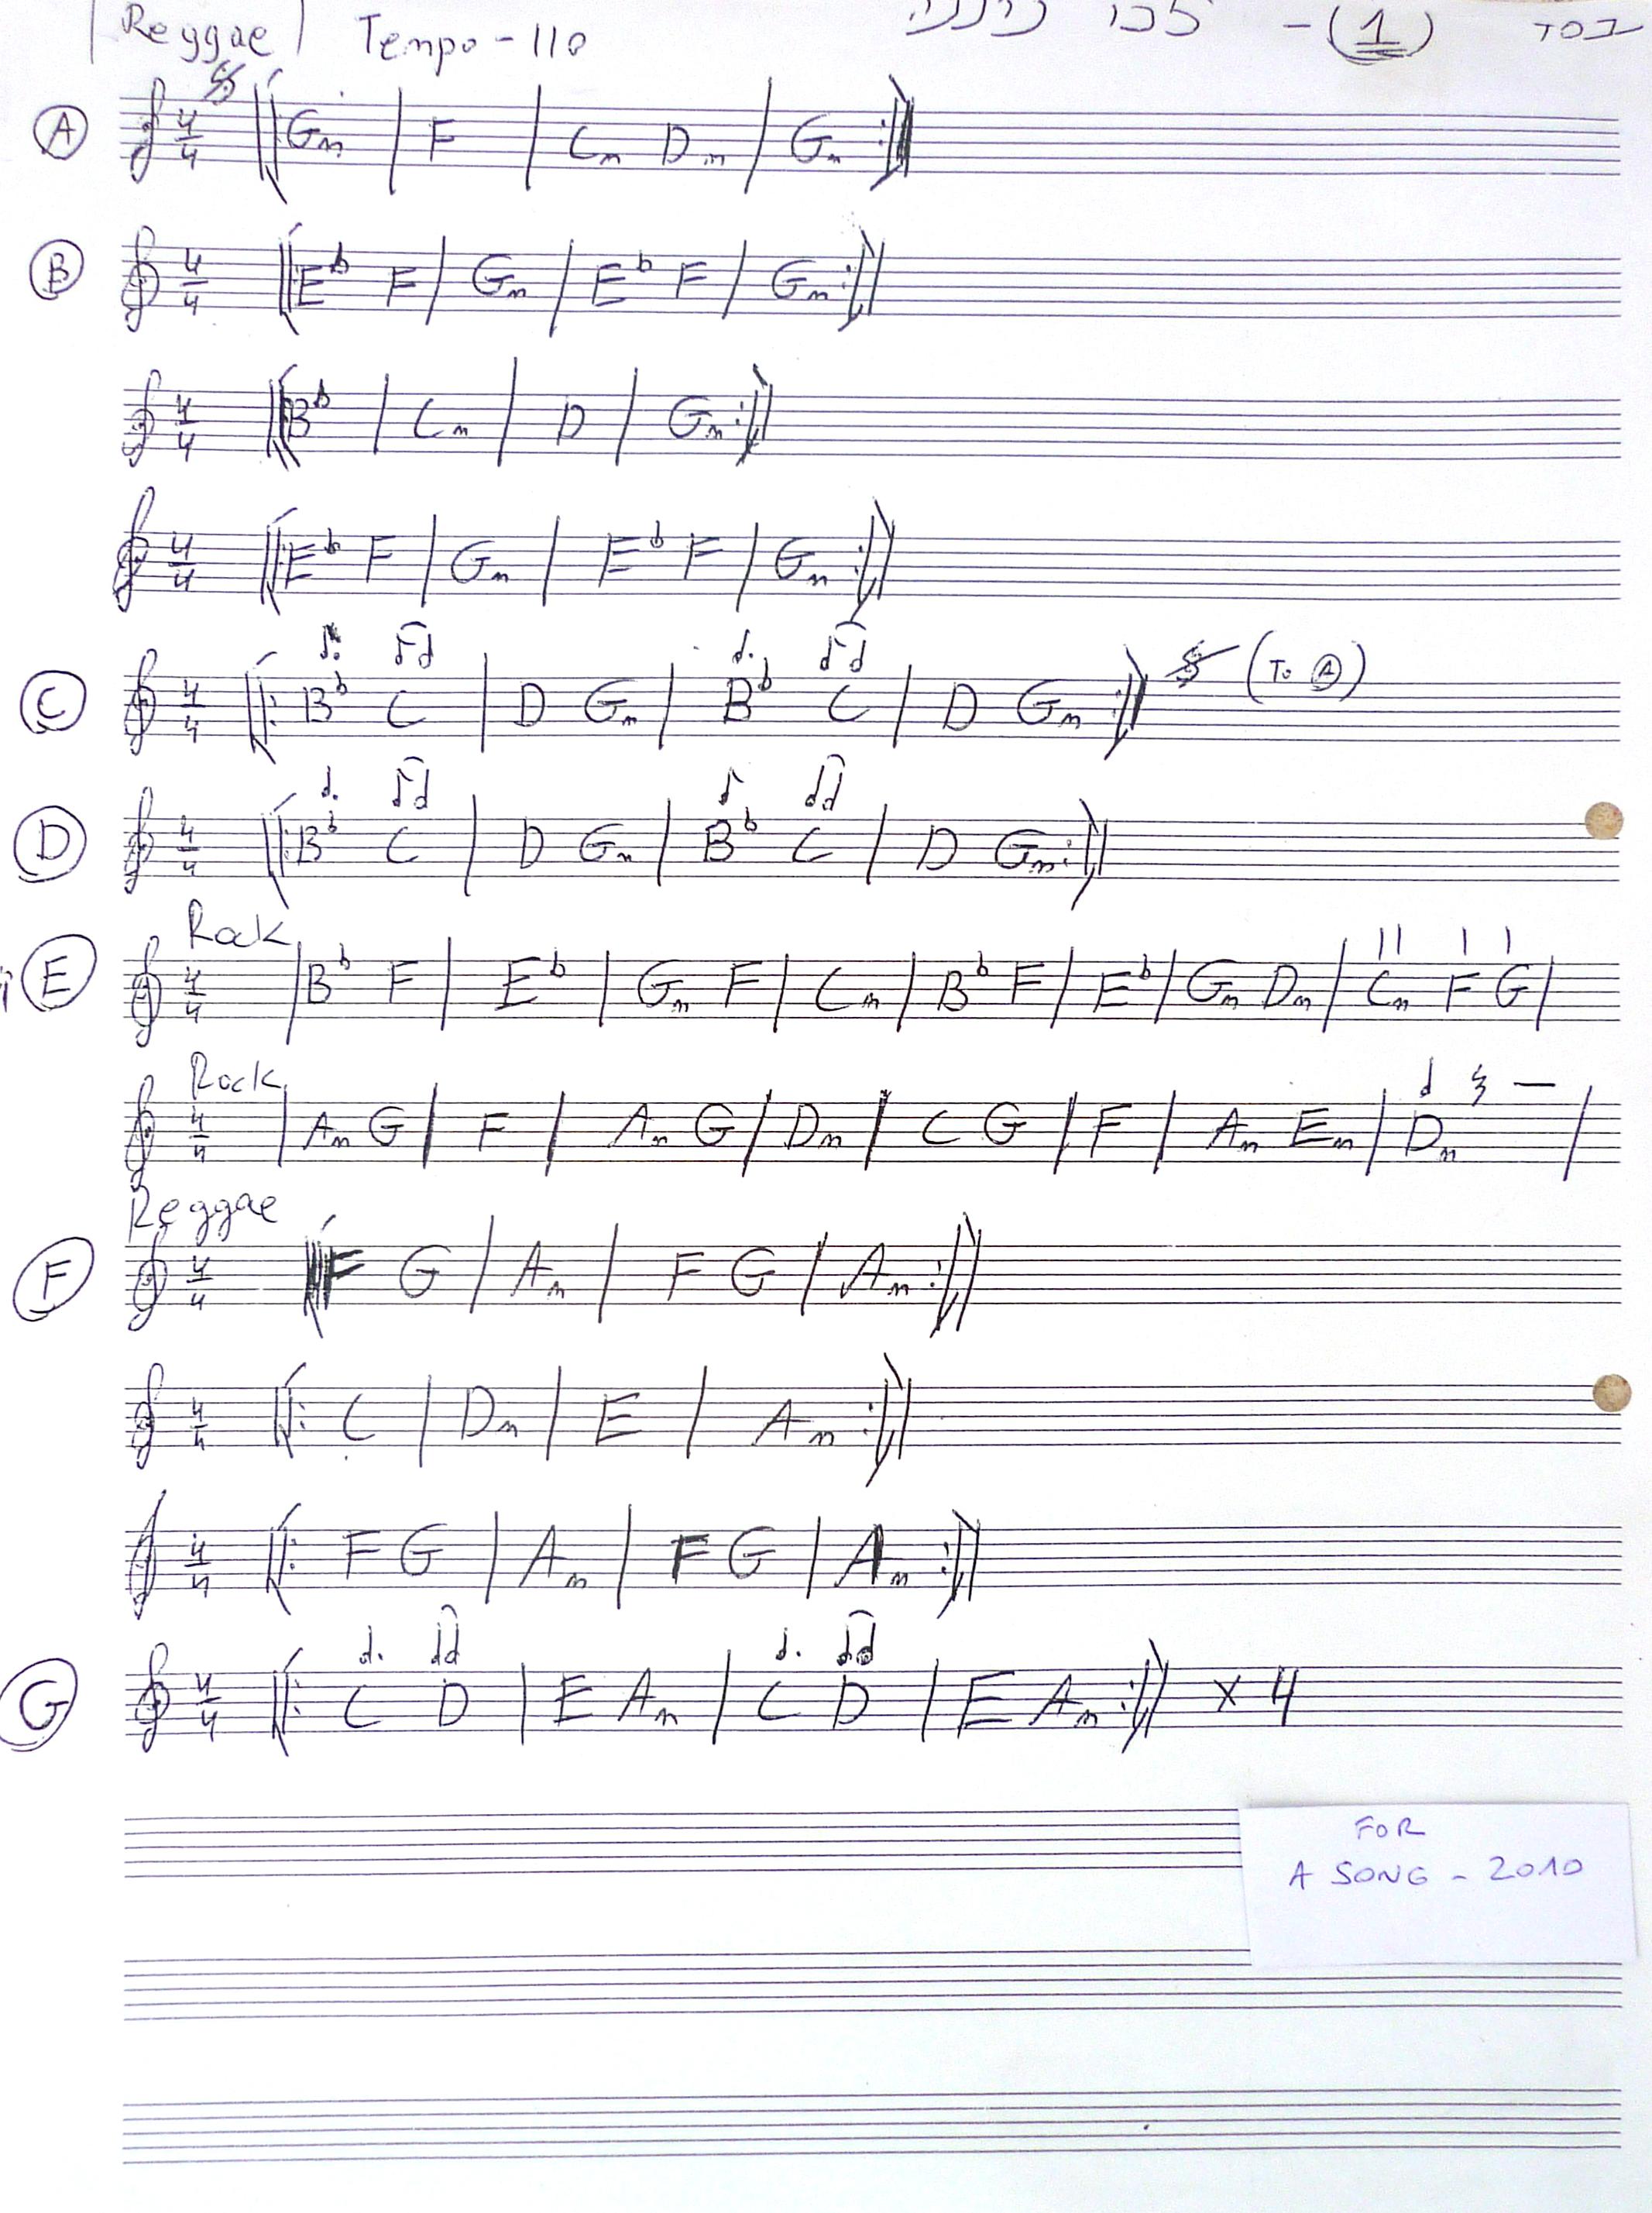 music 2, 2010.JPG